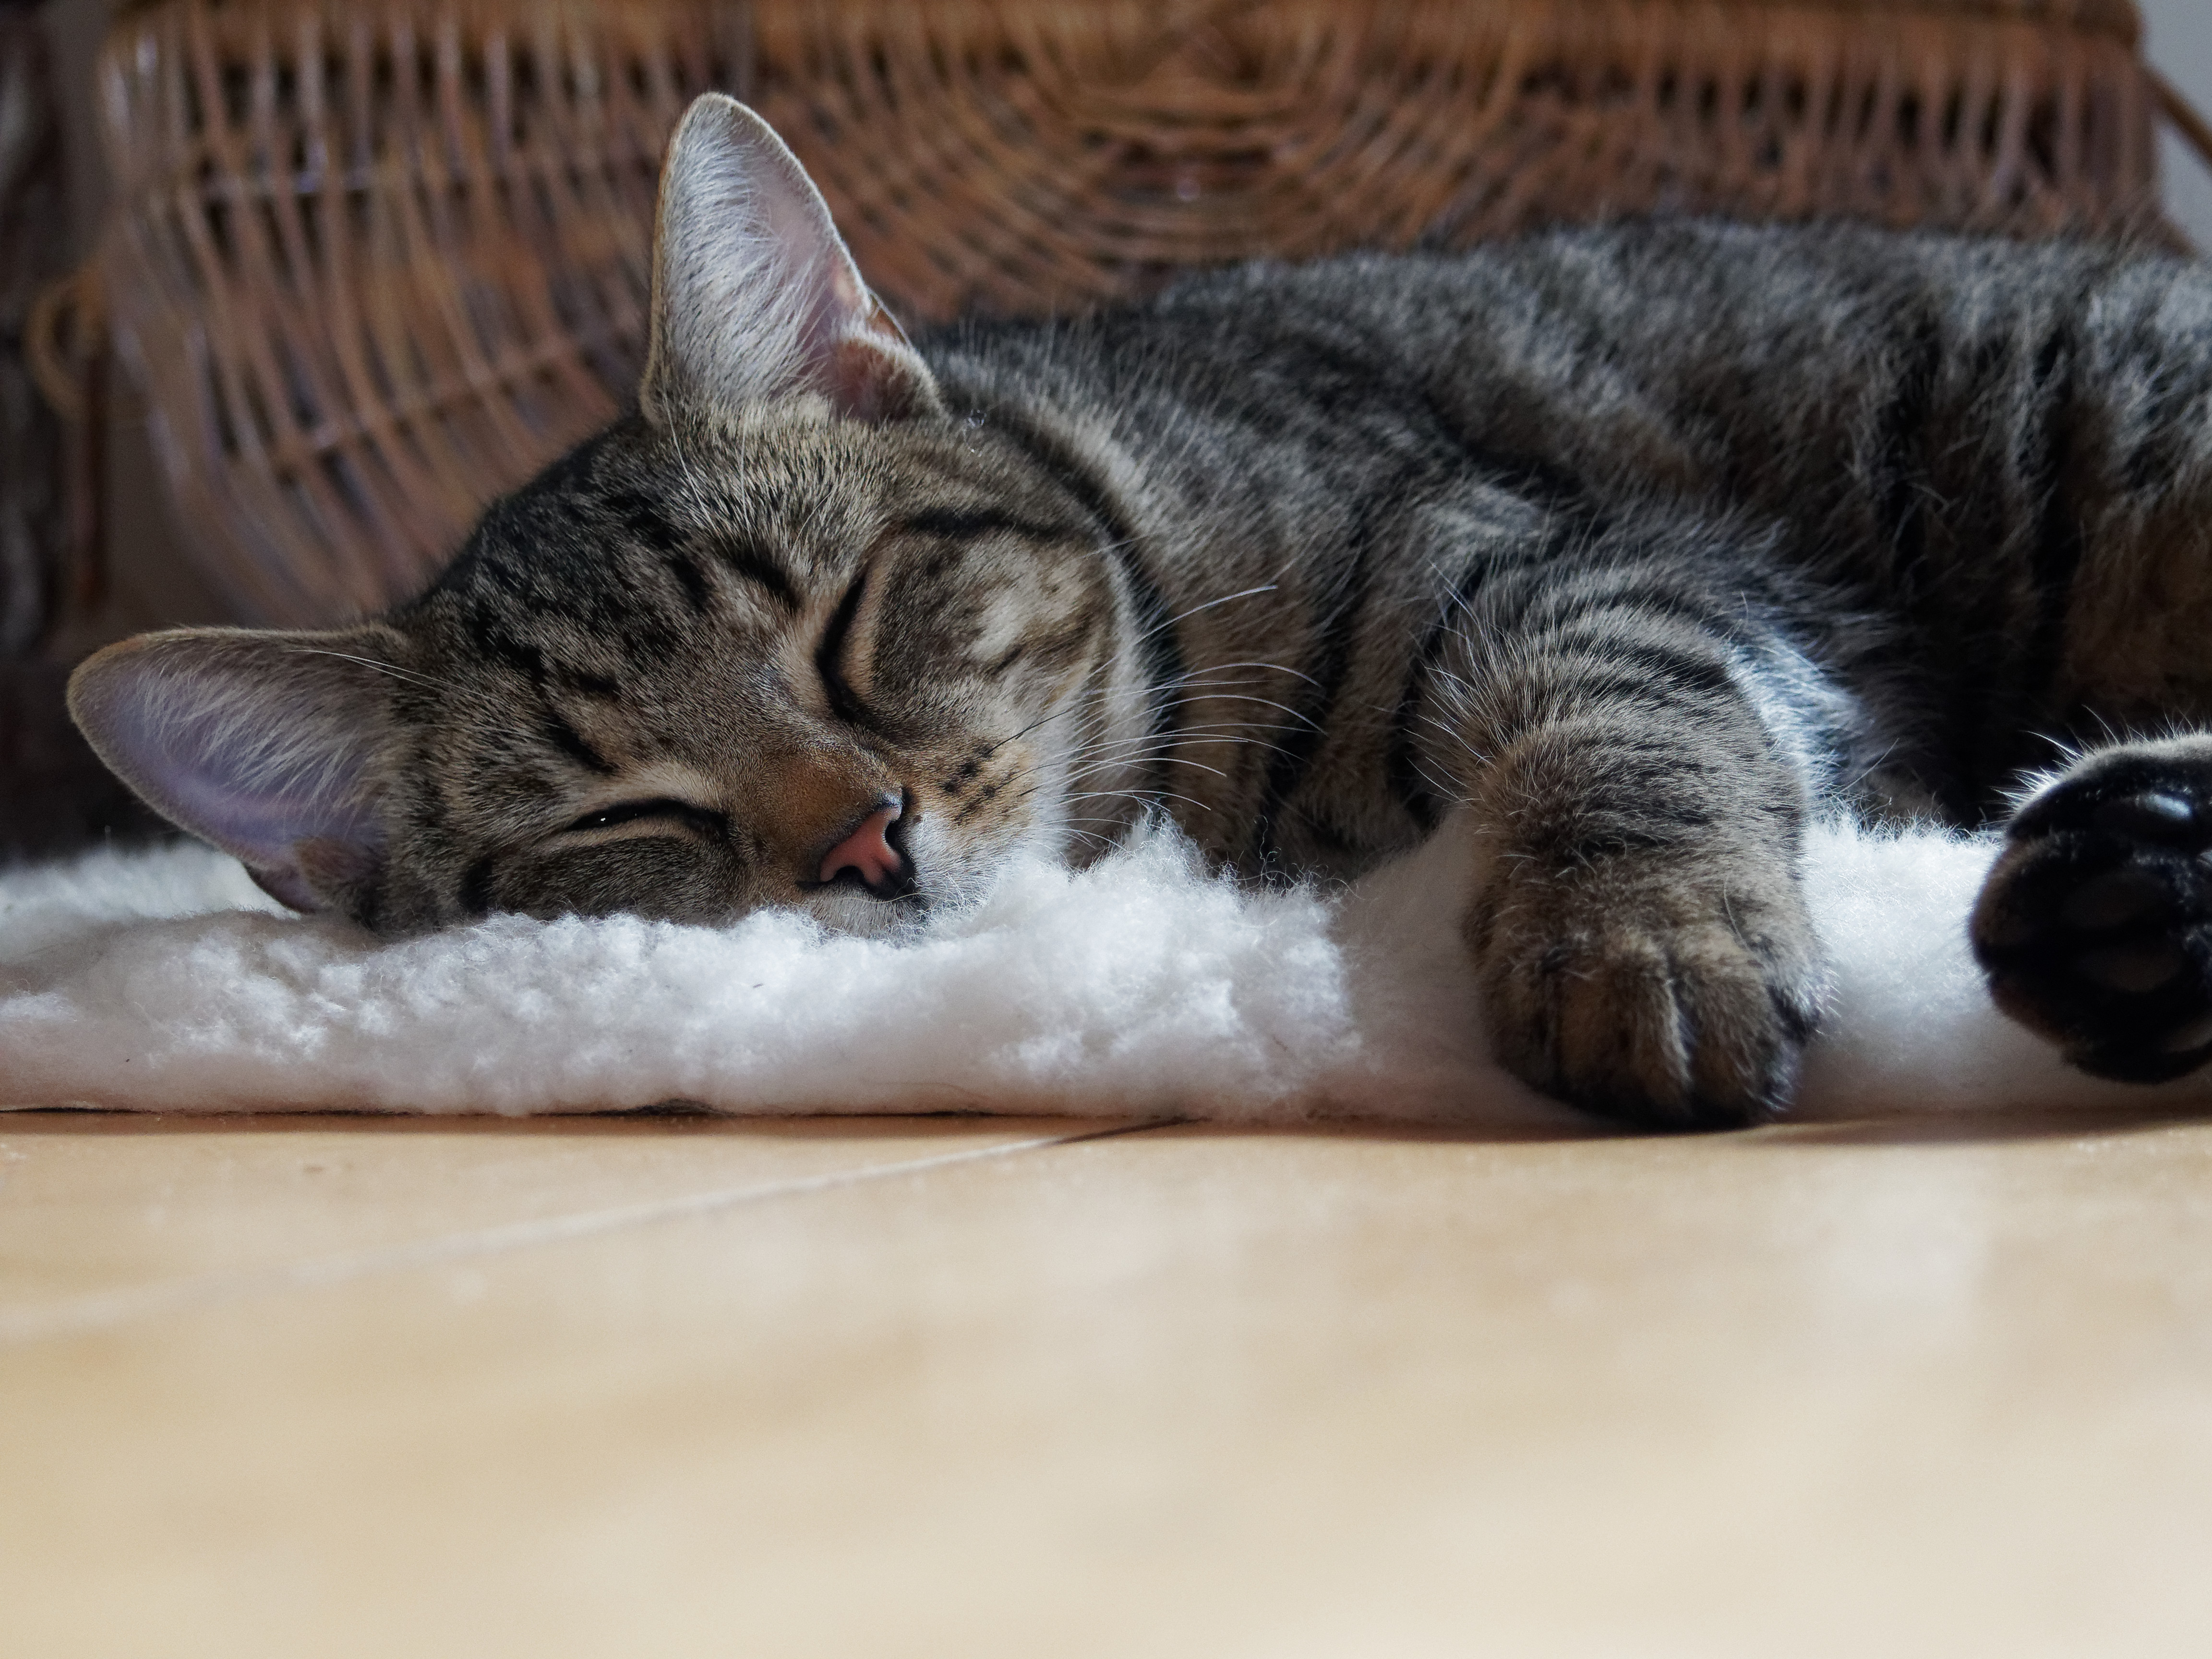 Brown Tabby Cat Lying On Shag Rug 183 Free Stock Photo